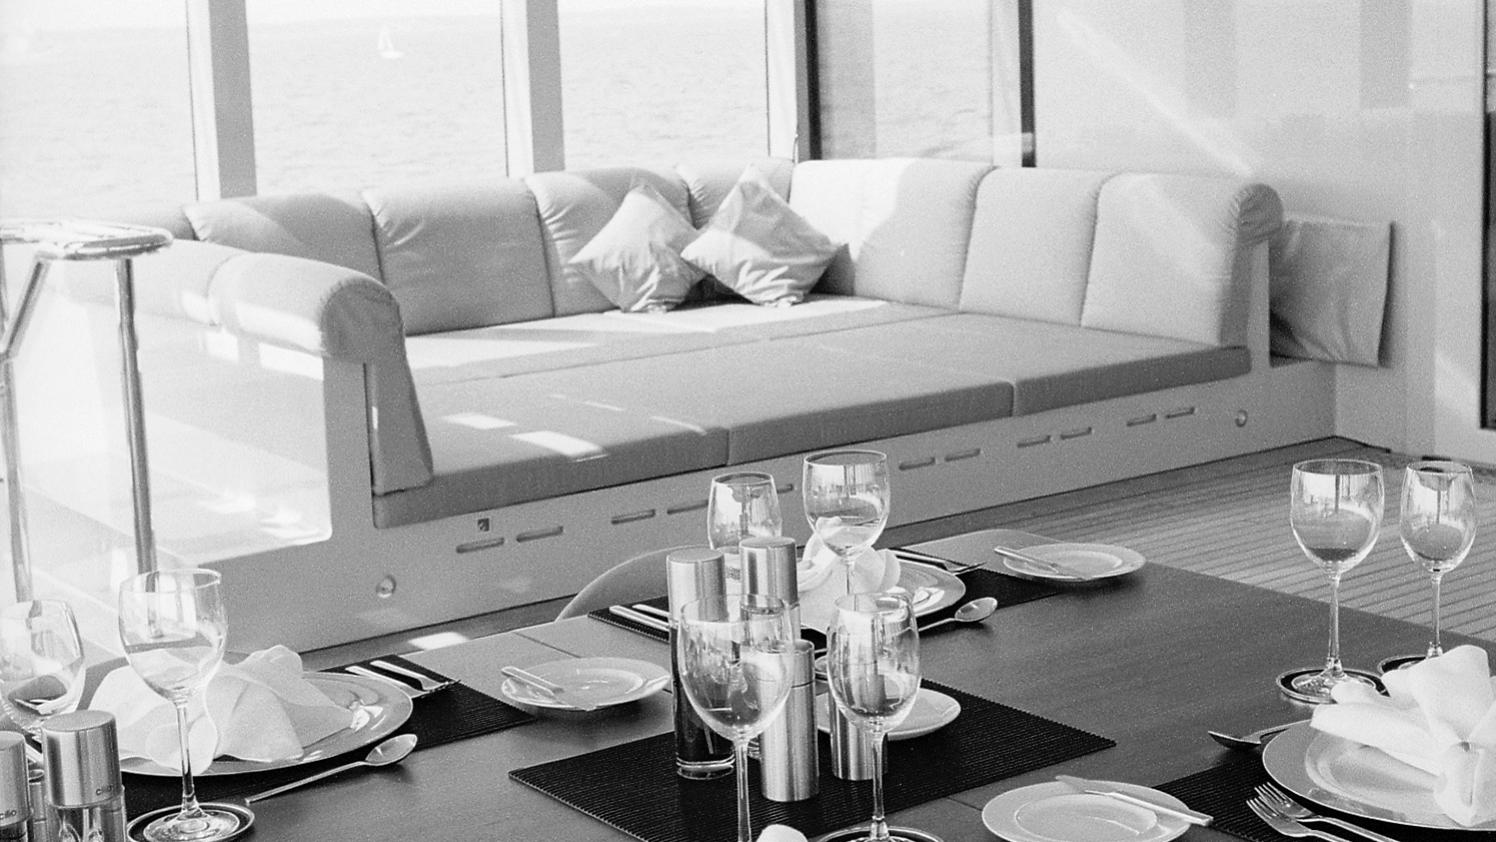 skat-explorer-yacht-lurssen-2002-71m-dining-room